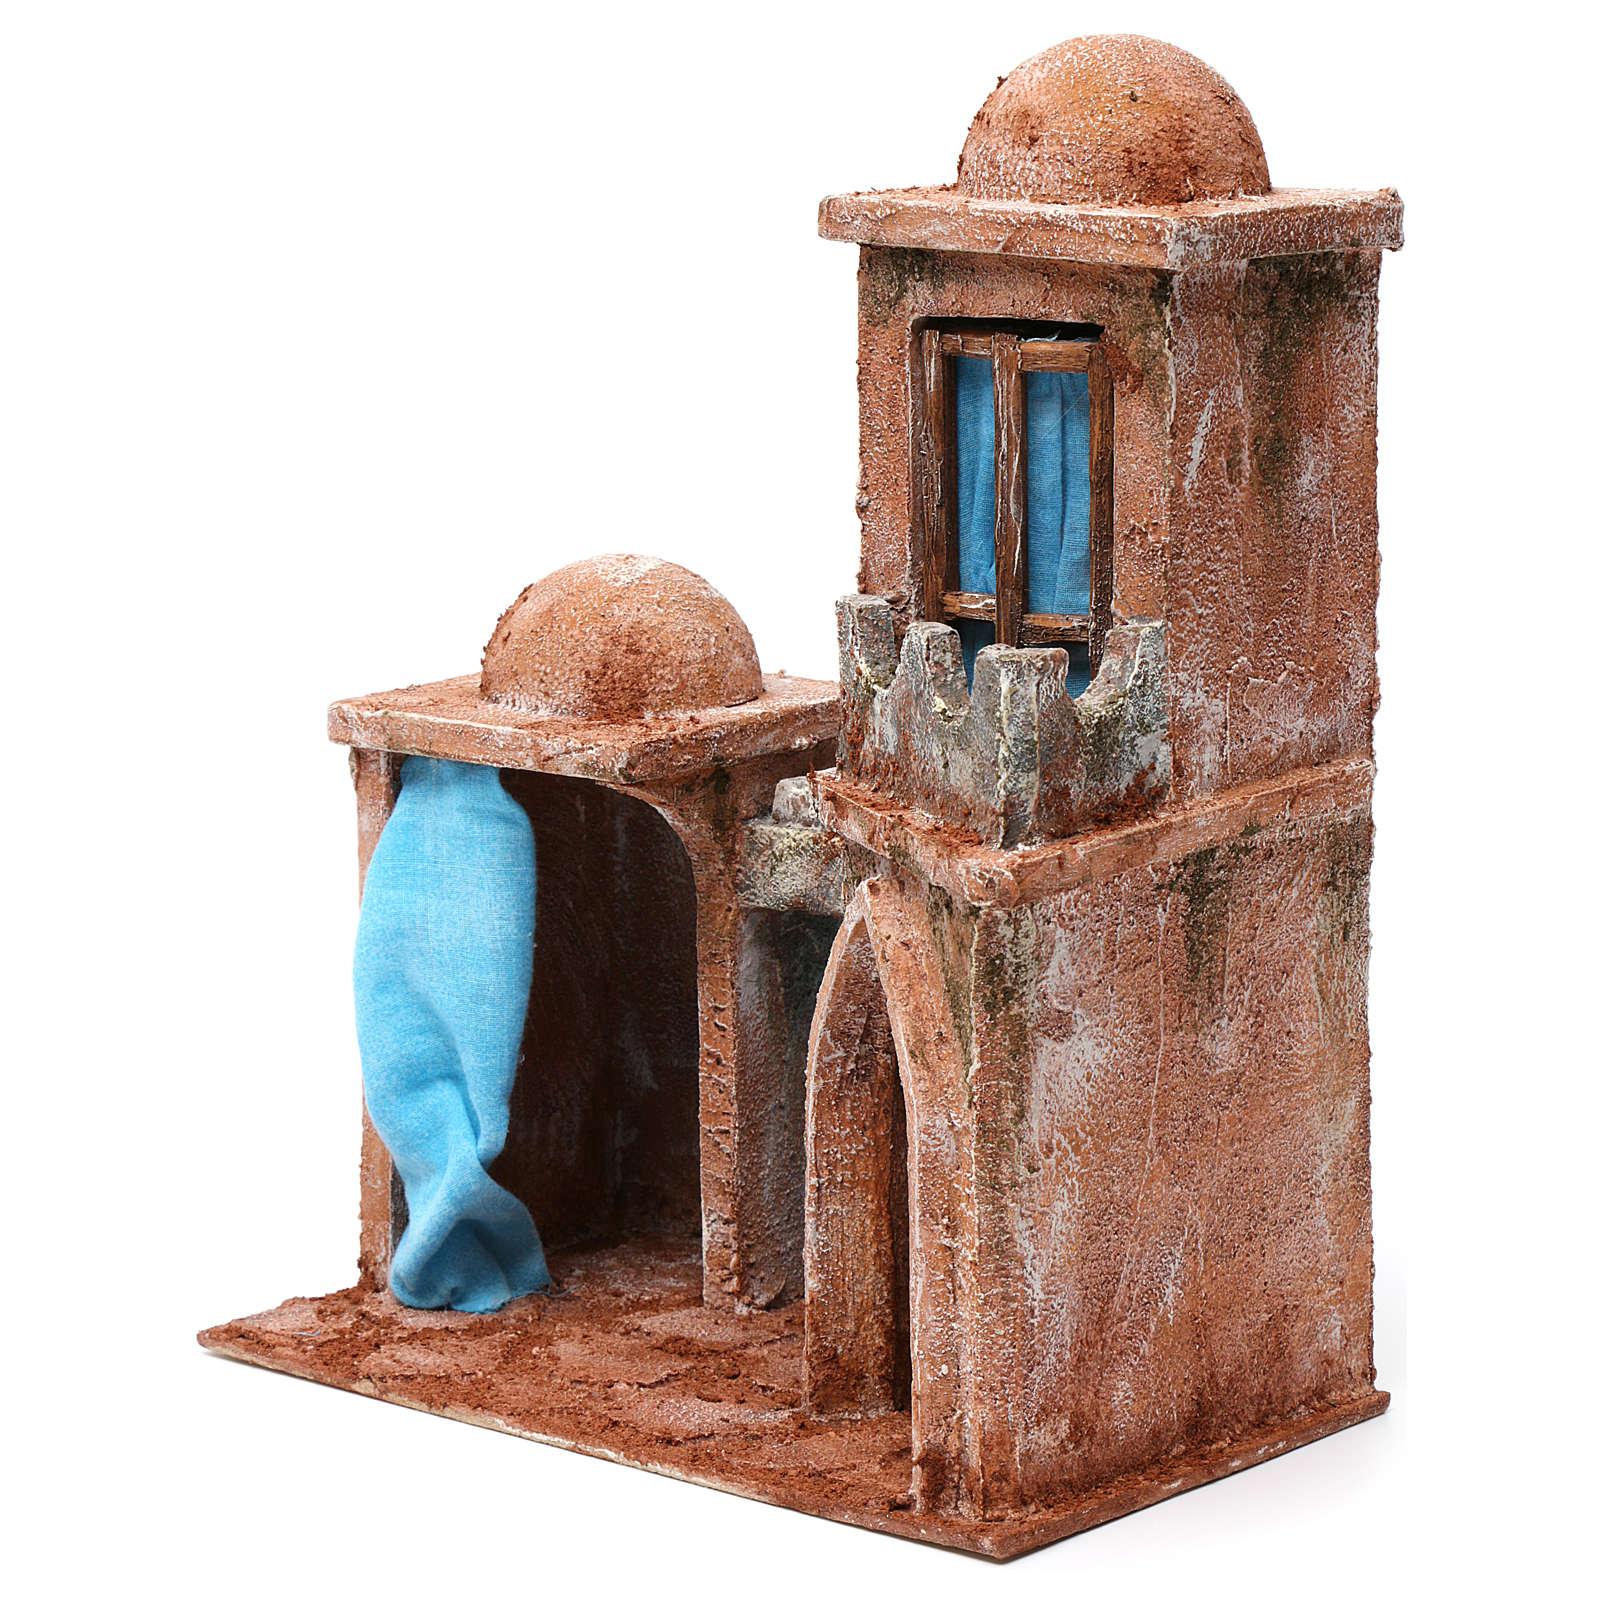 Casa árabe doble cúpula porche cortinas azules para belén 10 cm de altura media 30x25x15 4